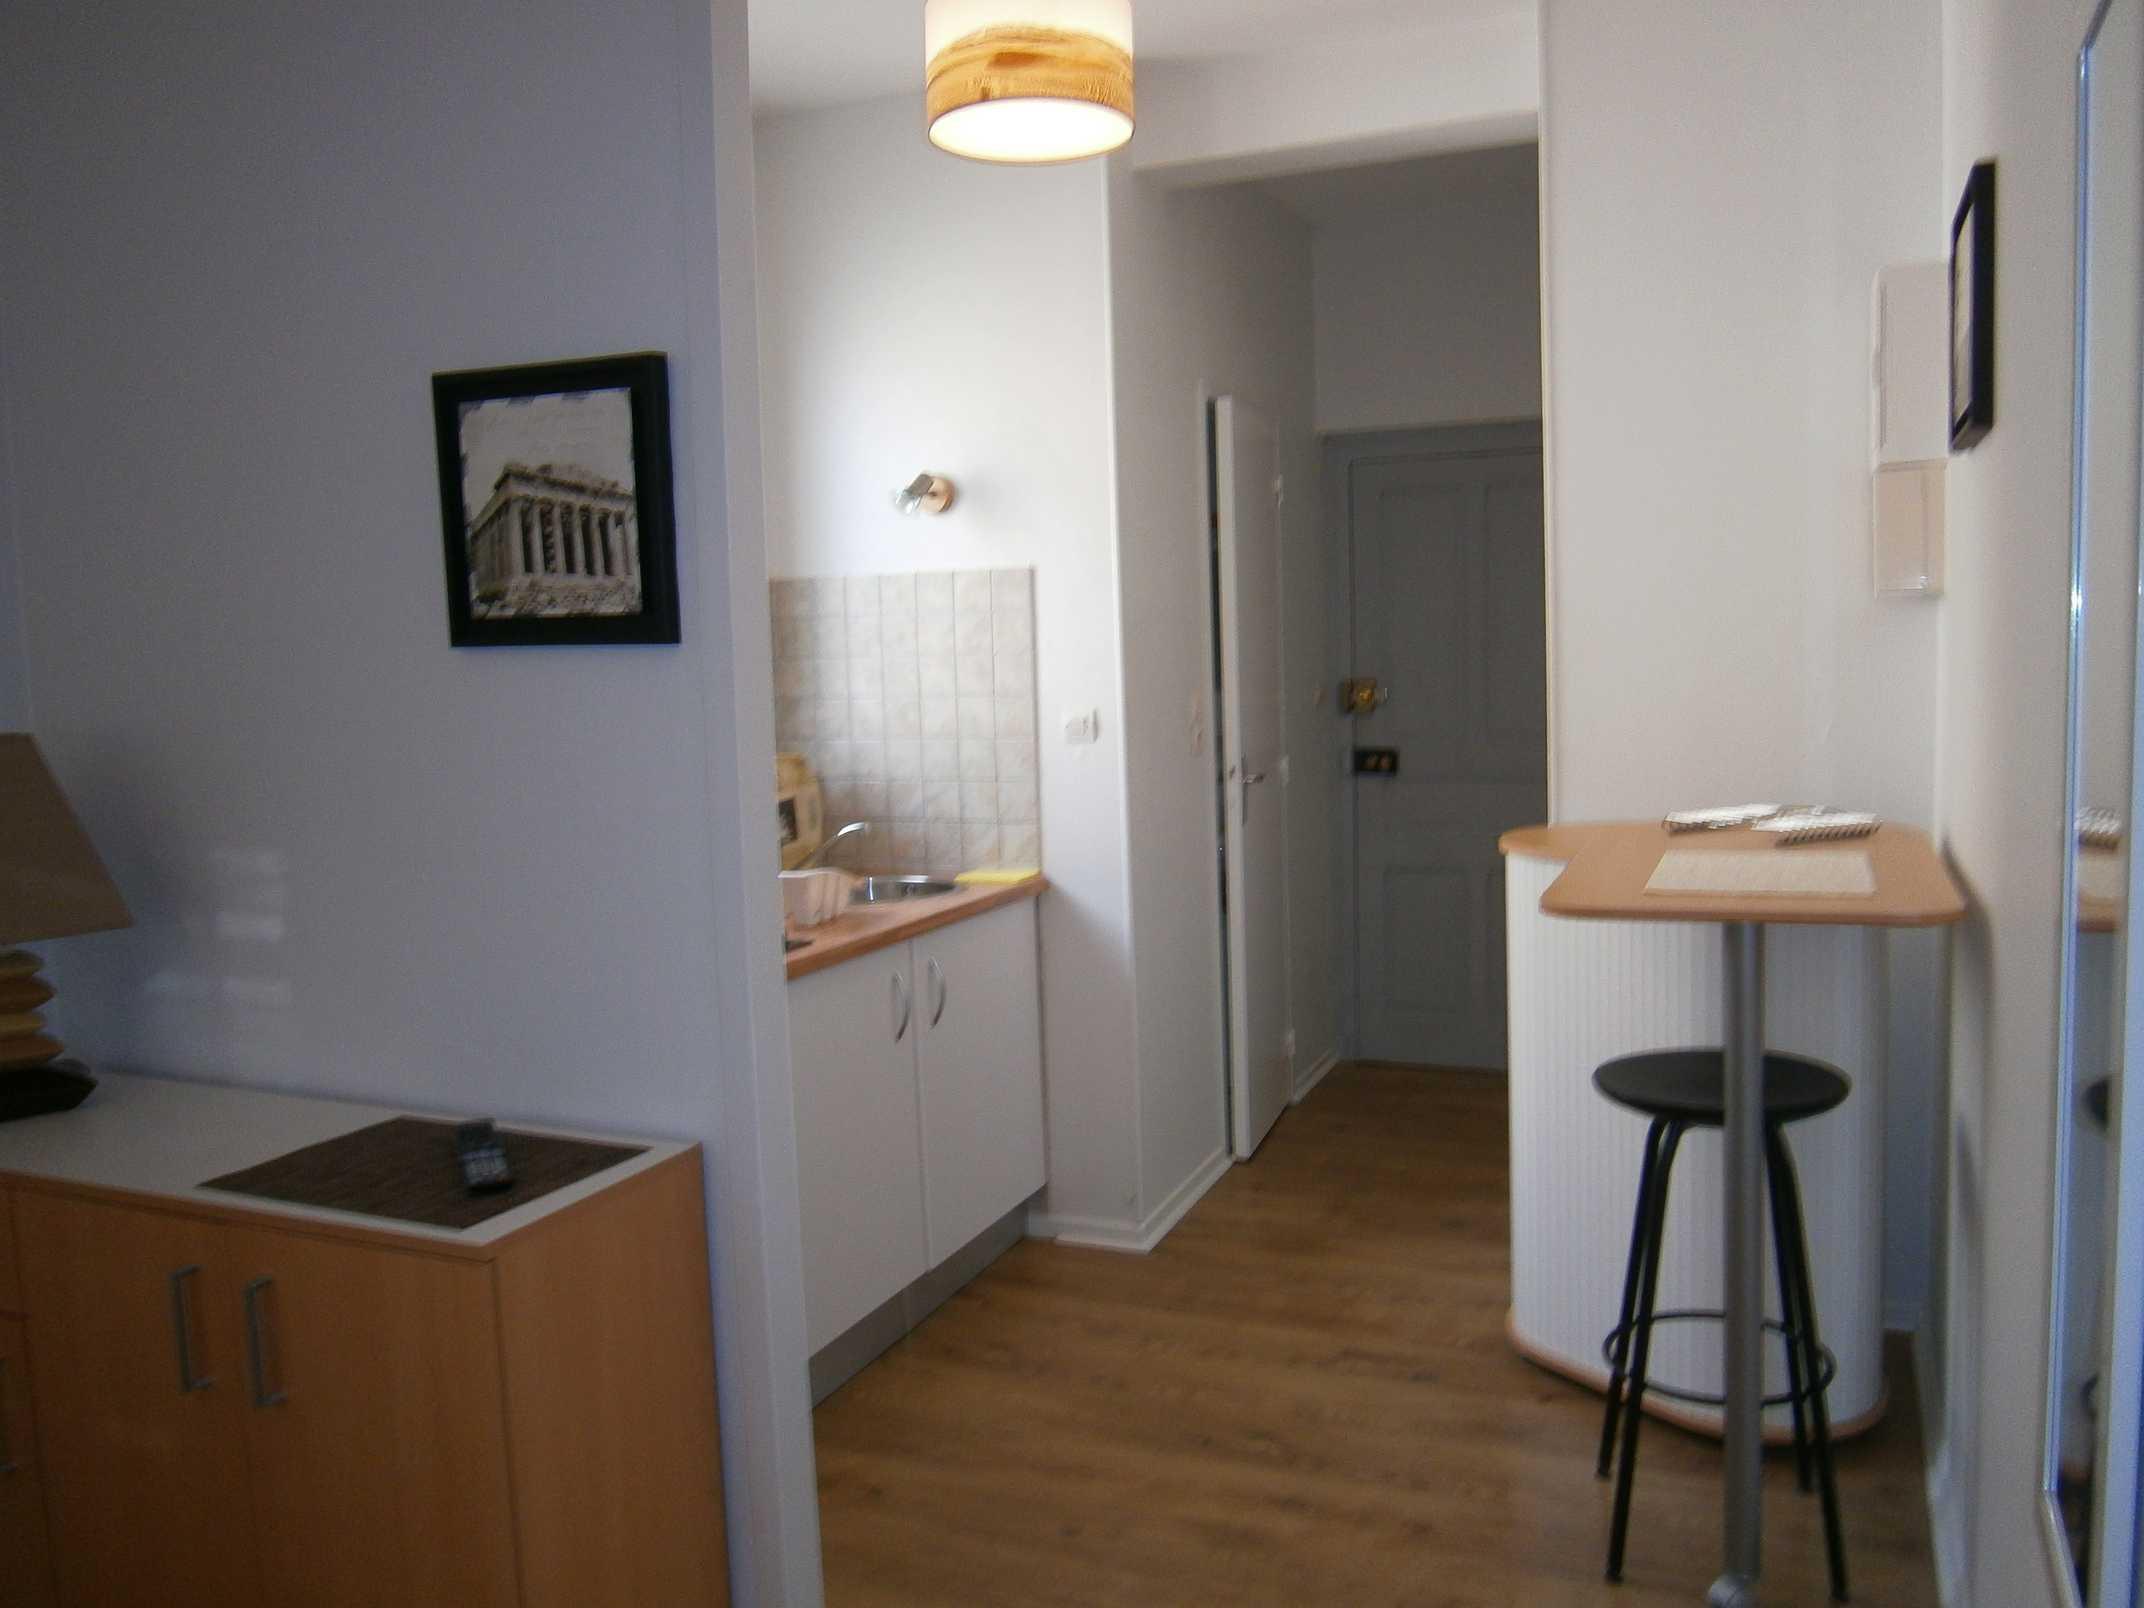 superbe studio meubl rue du 19 mars 62 id al logement tudiant begip begip. Black Bedroom Furniture Sets. Home Design Ideas